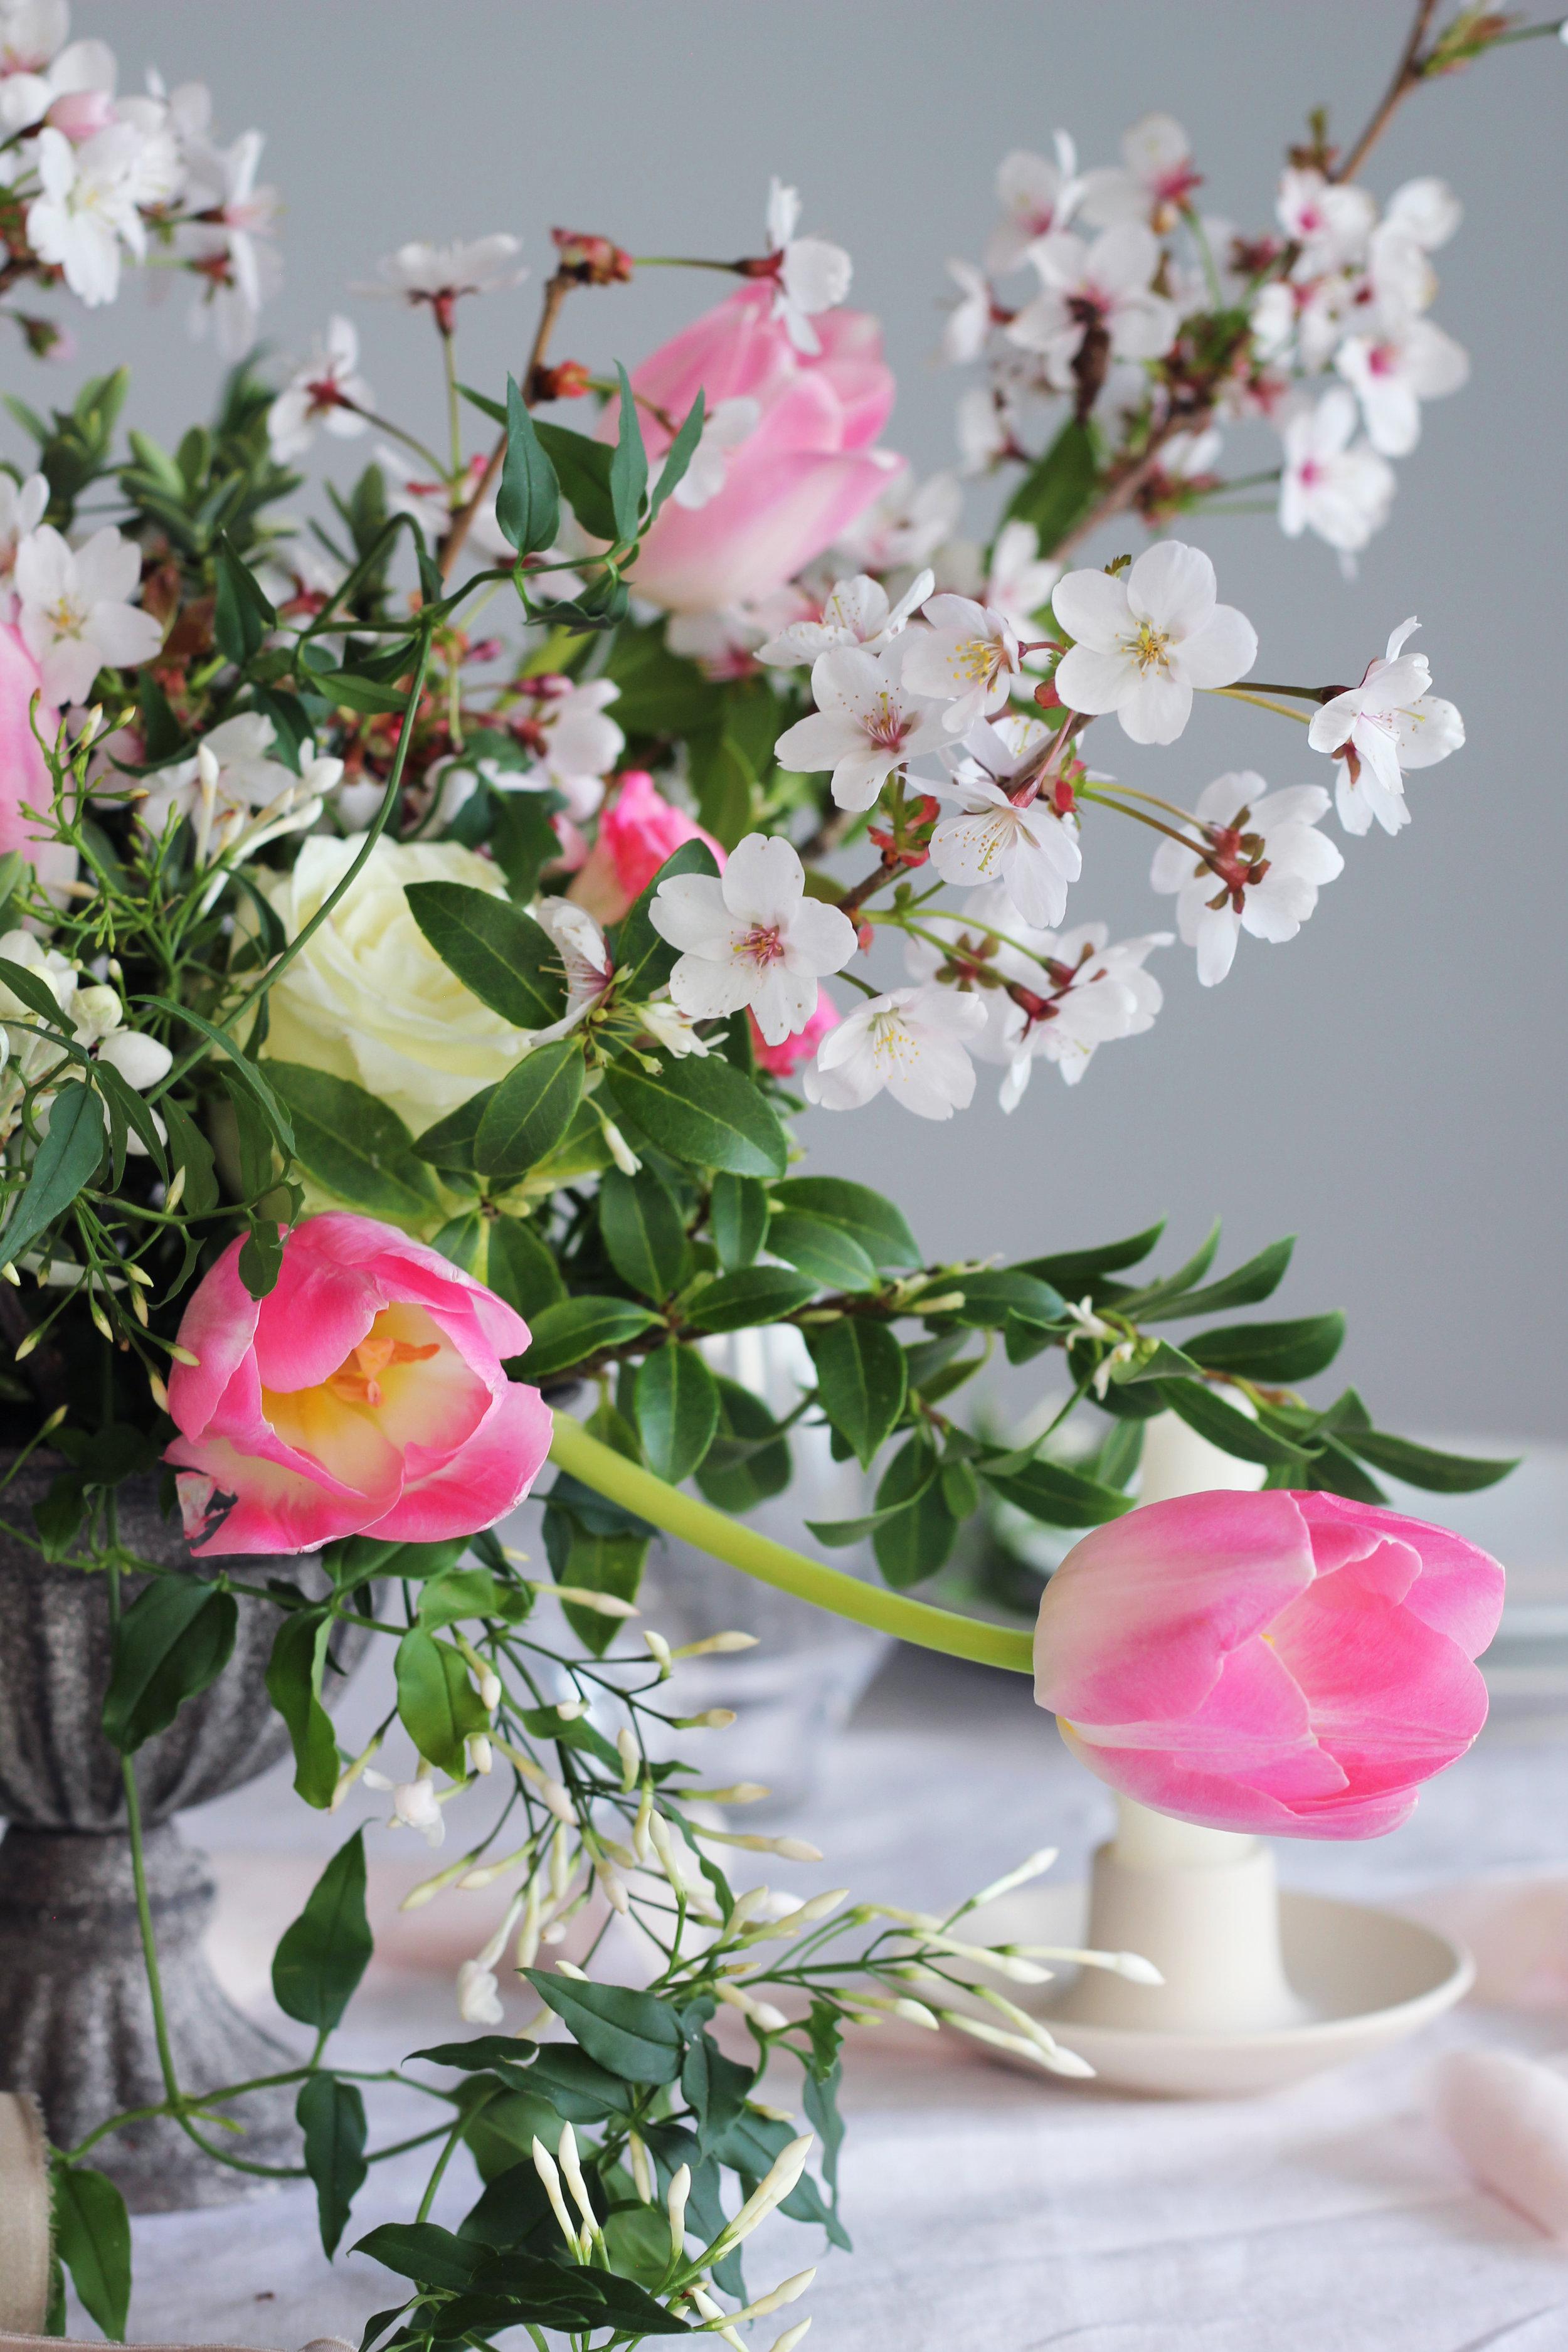 Callie-Pettigrew-Springtime-Wedding-13.jpg